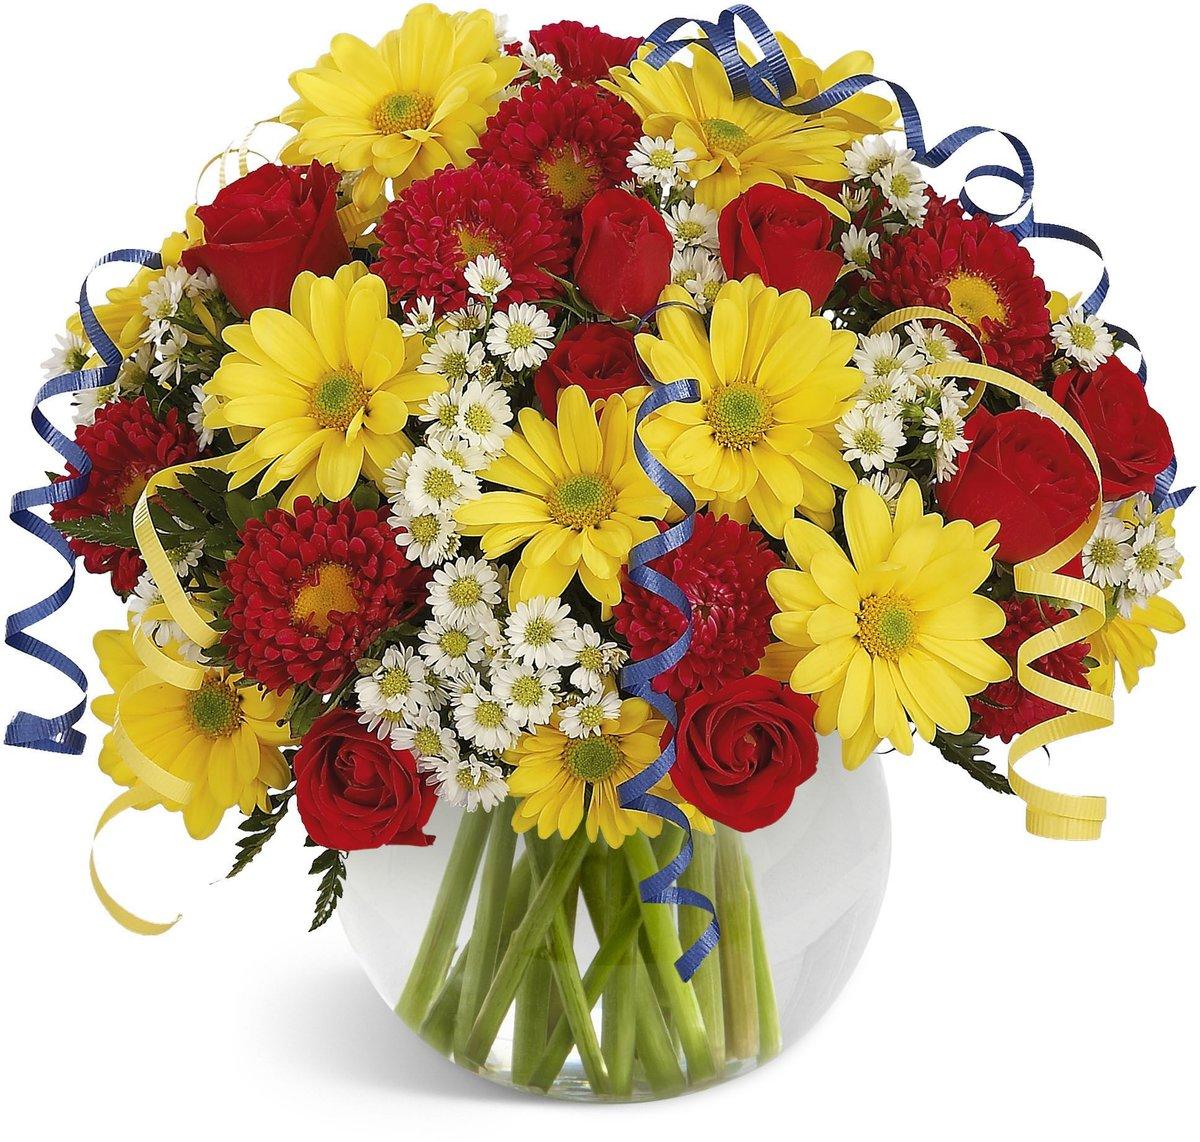 Признания, картинки с хризантемами с днем рождения